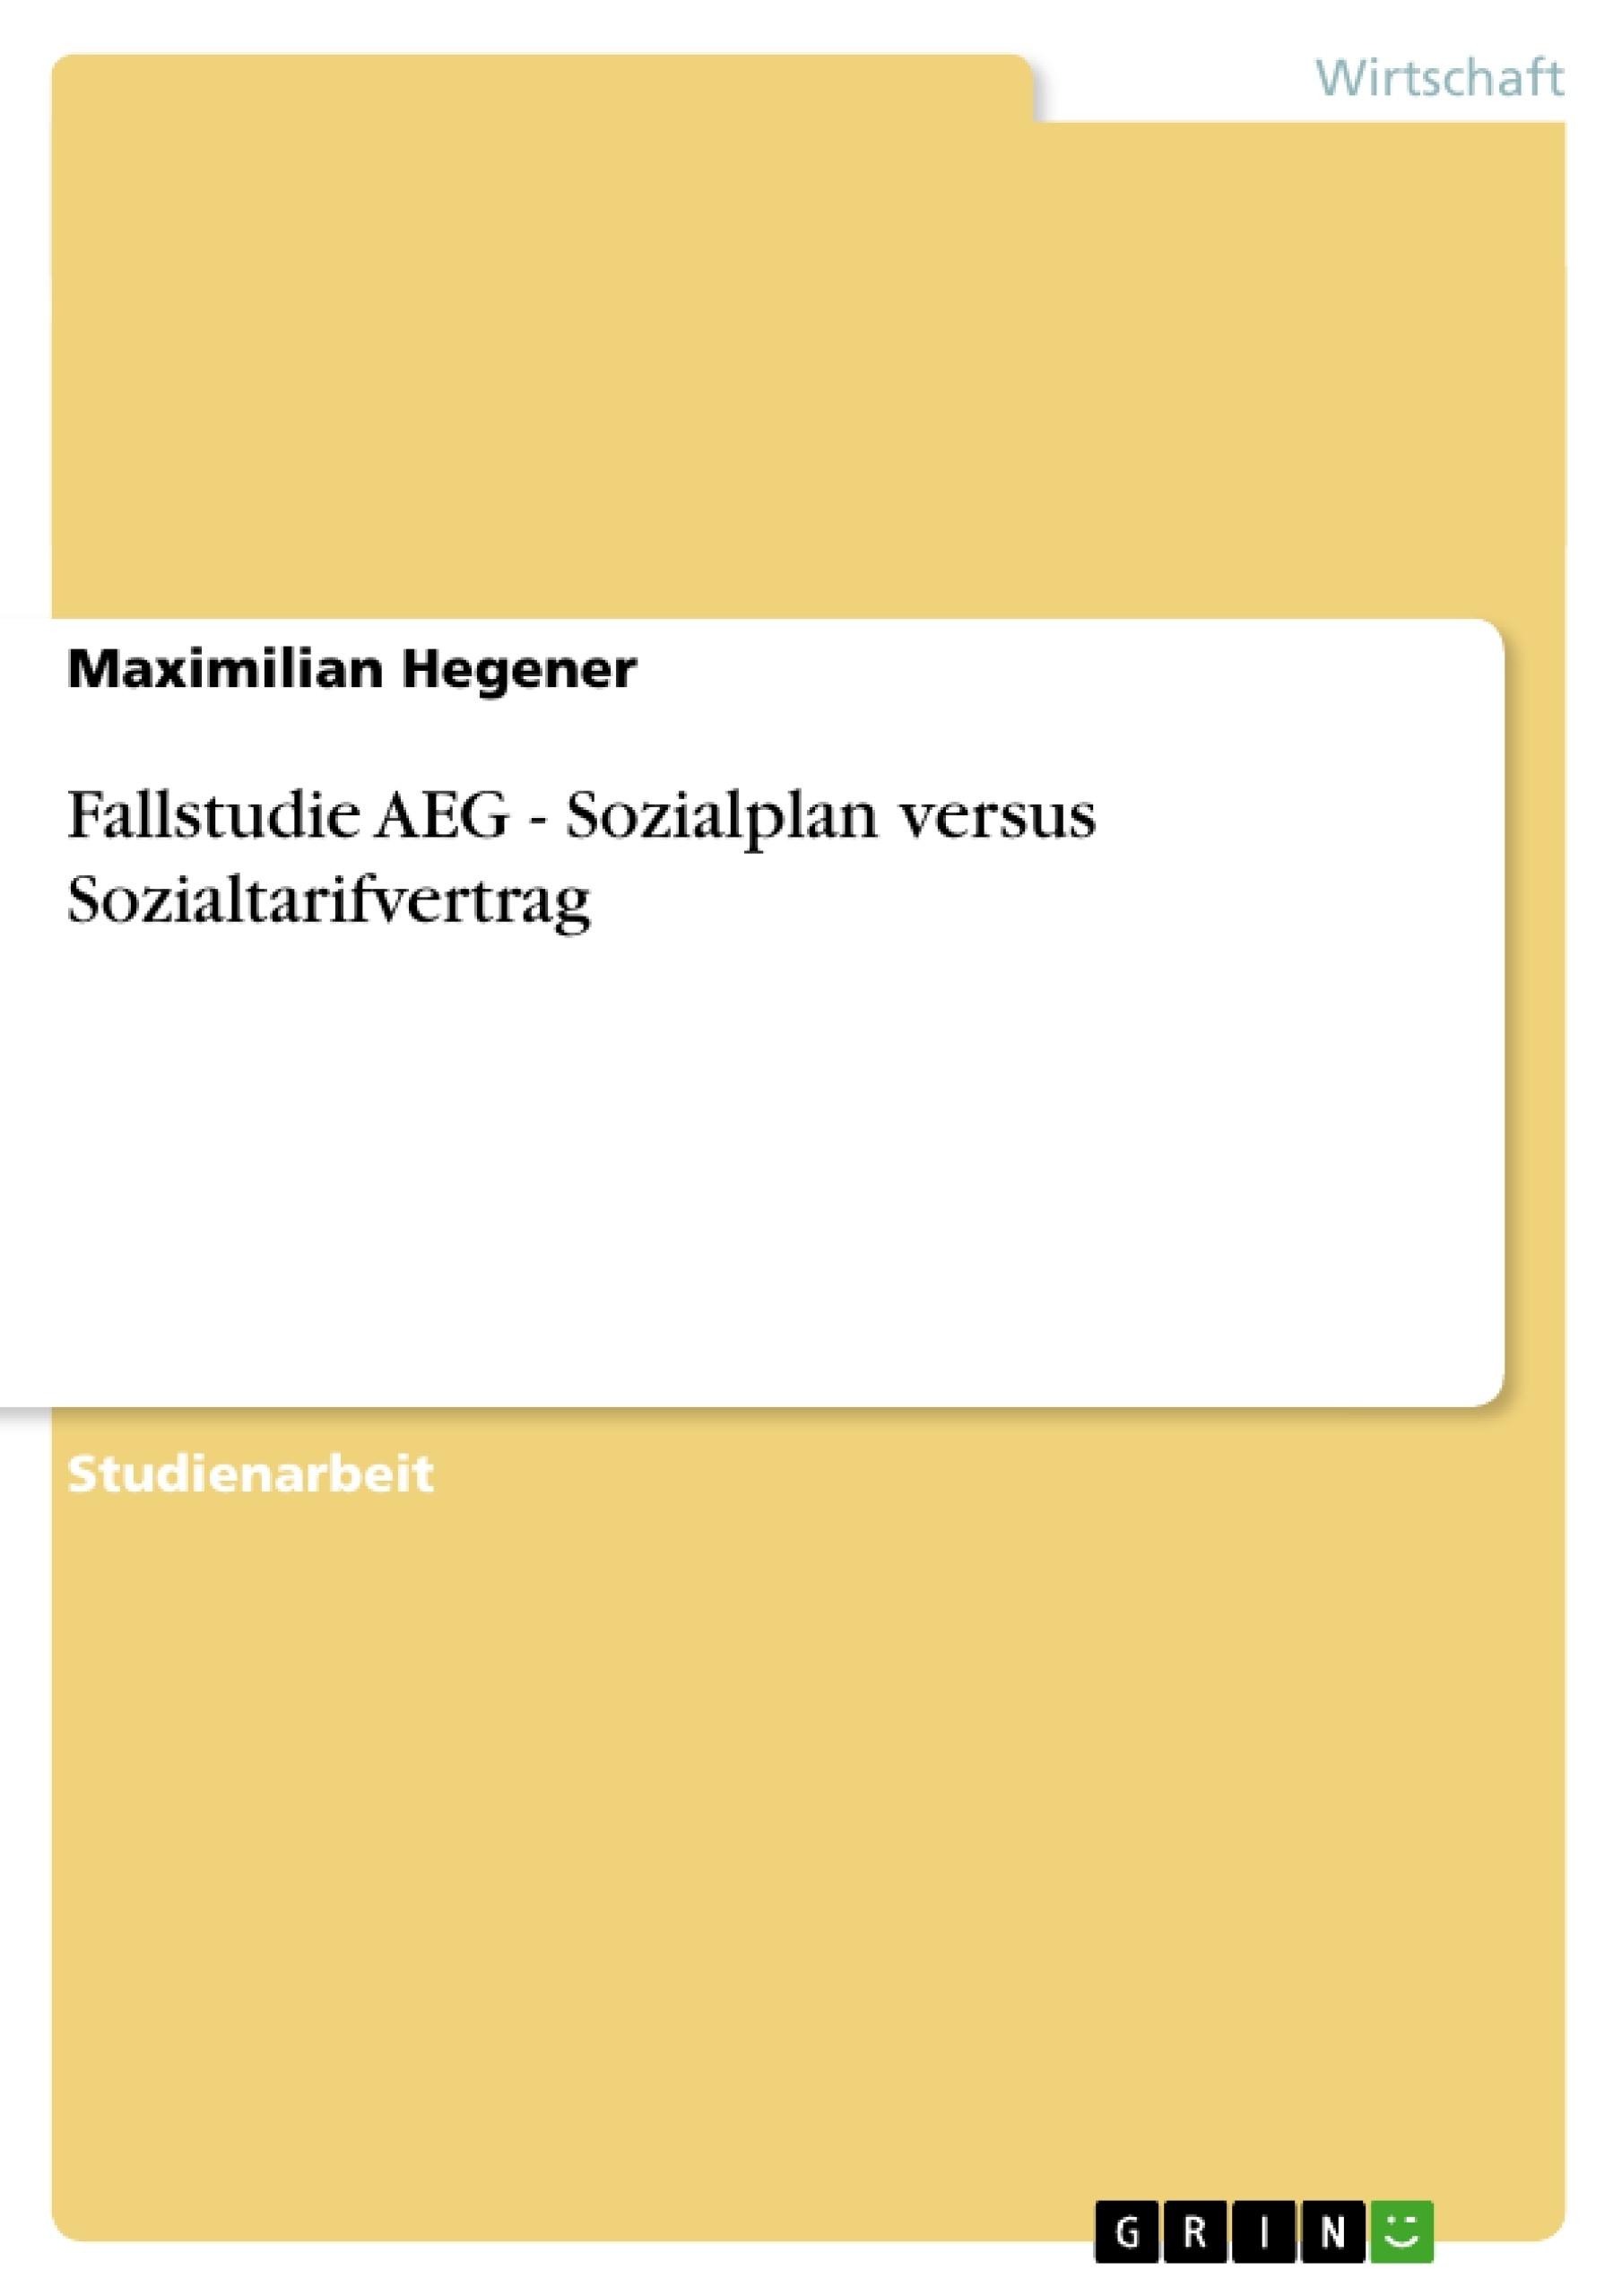 Titel: Fallstudie AEG - Sozialplan versus Sozialtarifvertrag